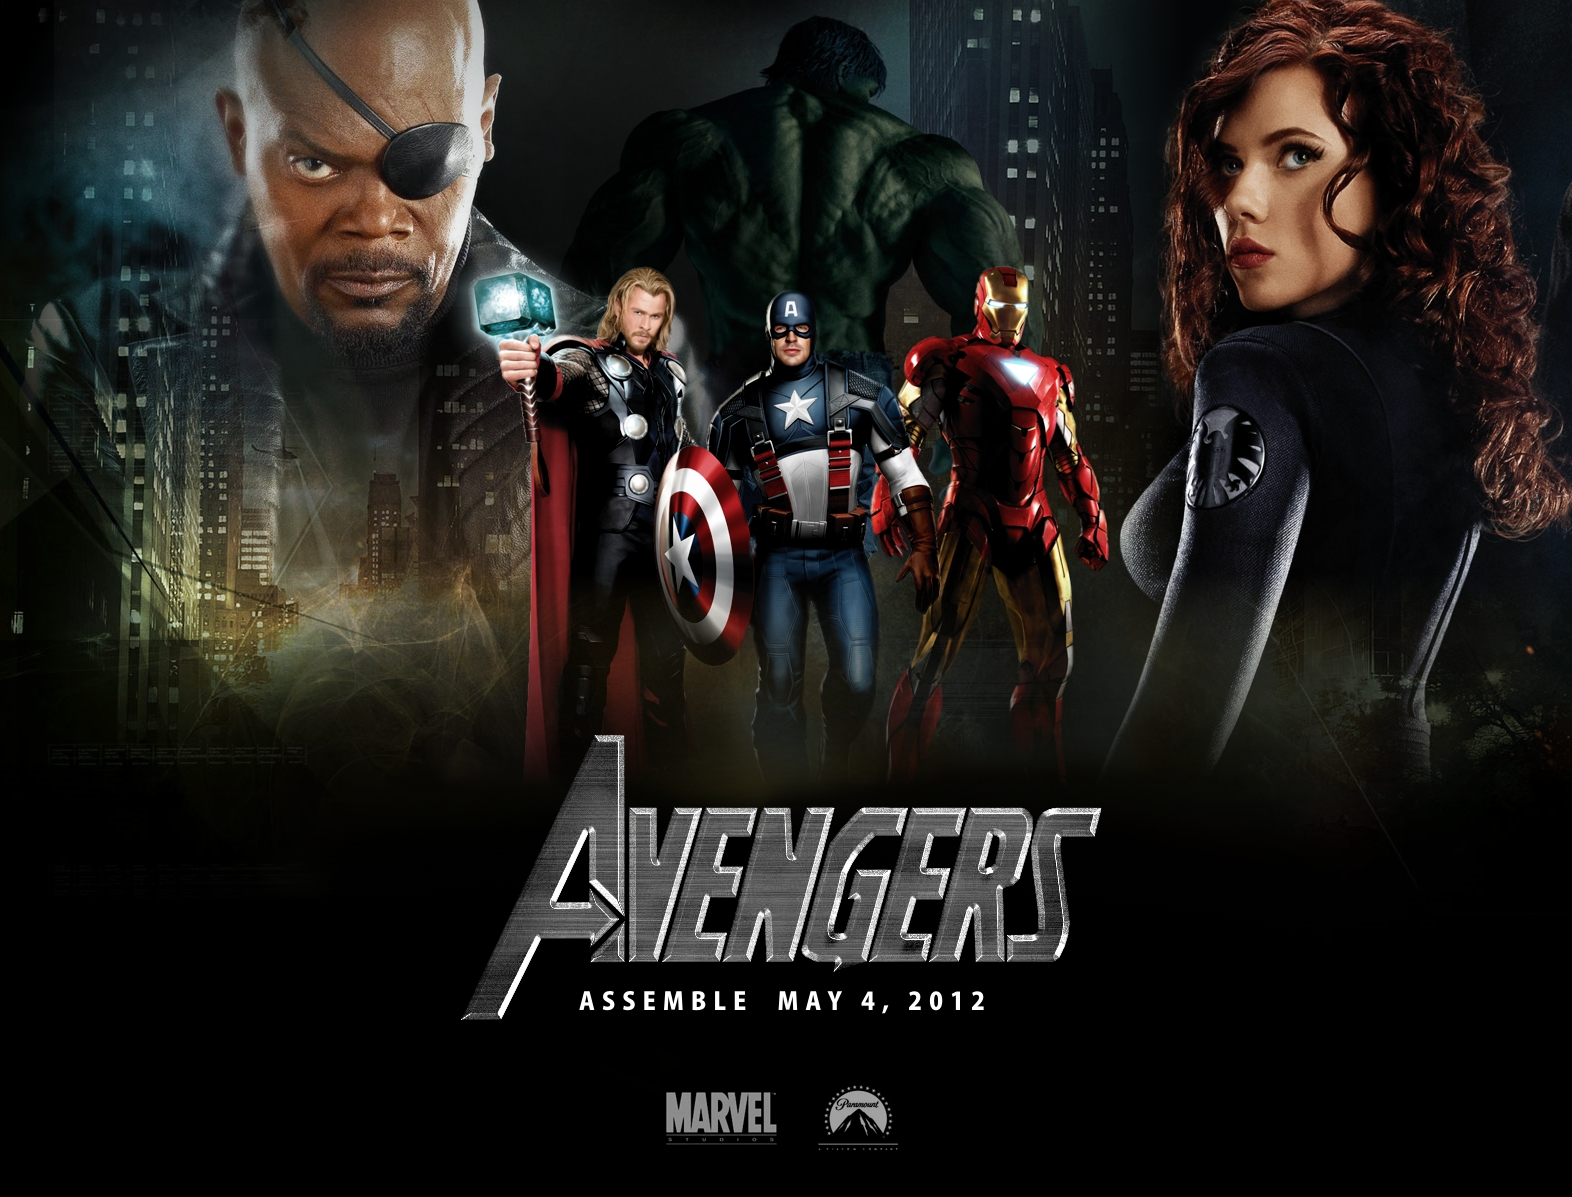 the avengers 2012 wallpaper hd